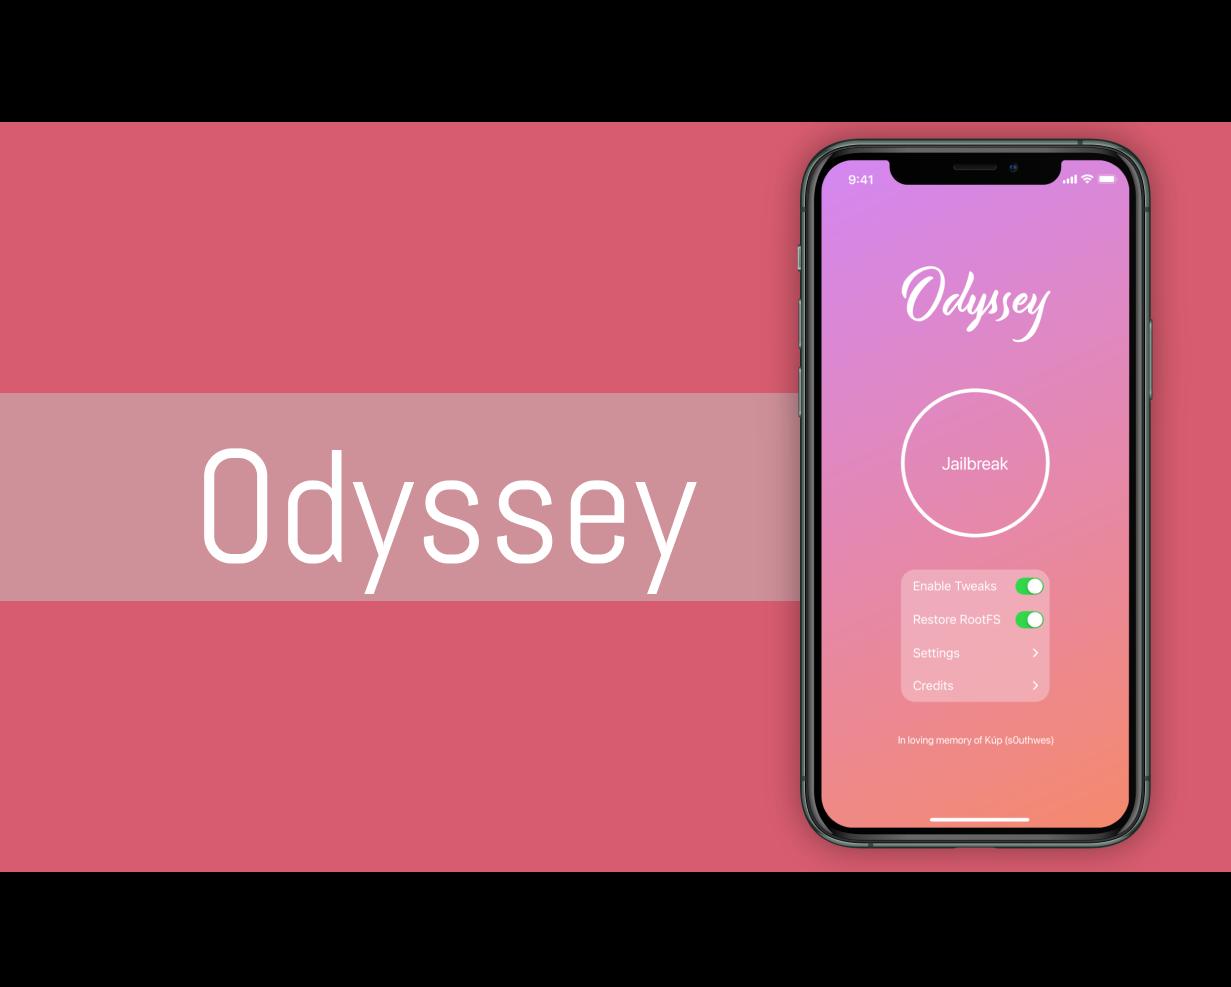 How to Jailbreak iOS 13 - iOS 13.7 Odyssey